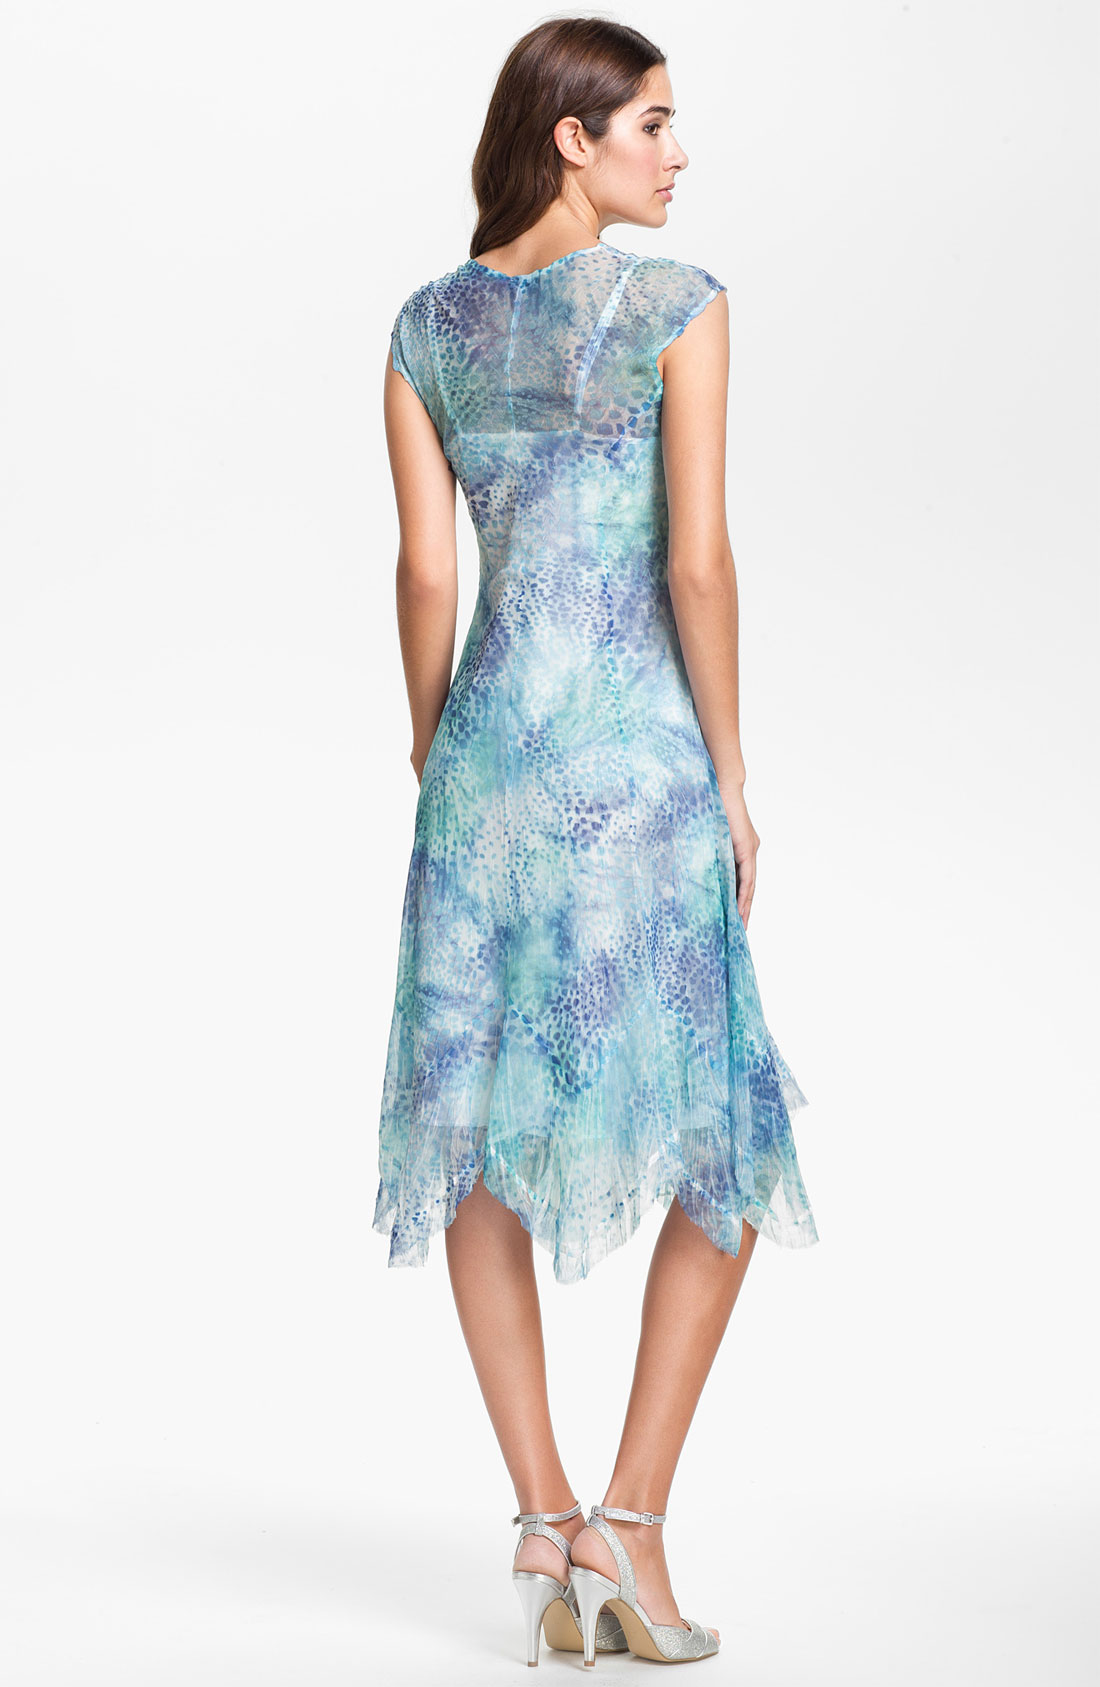 Komarov Dresses Nordstrom – fashion dresses